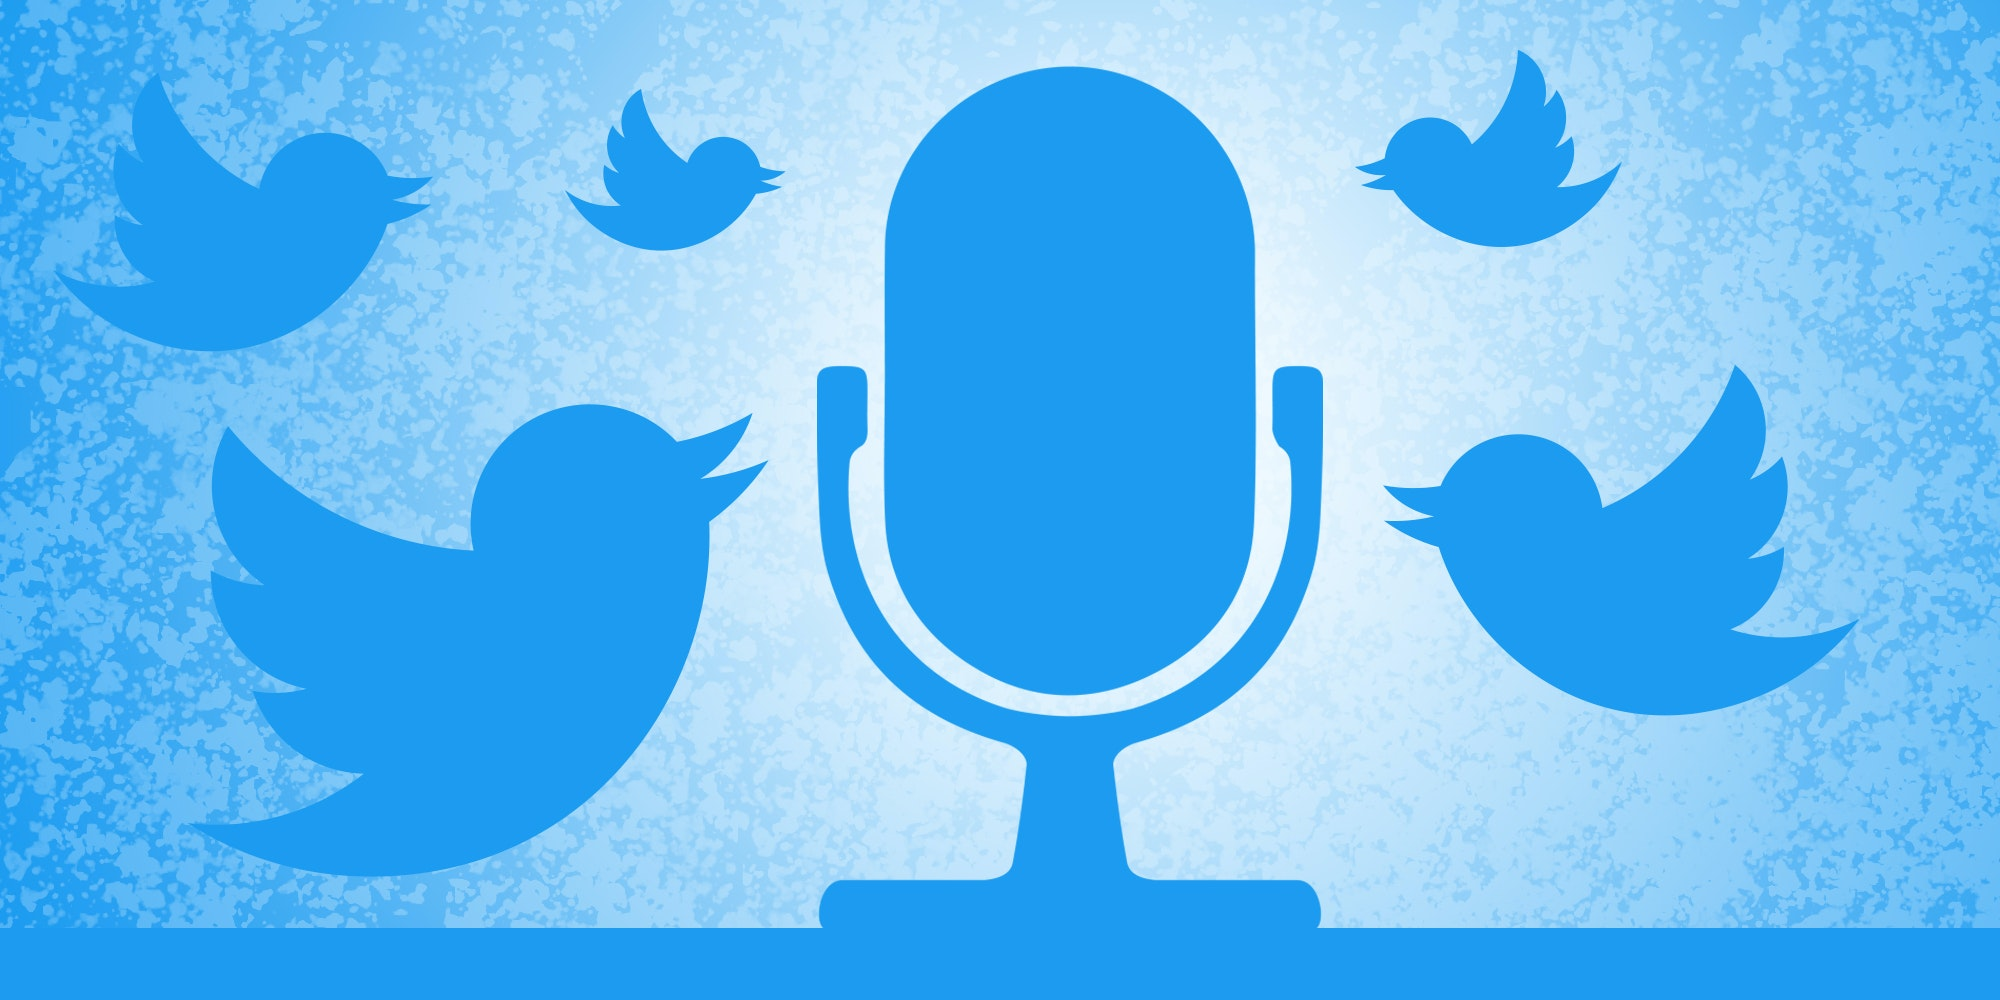 Twitter bird logos fluttering around microphone